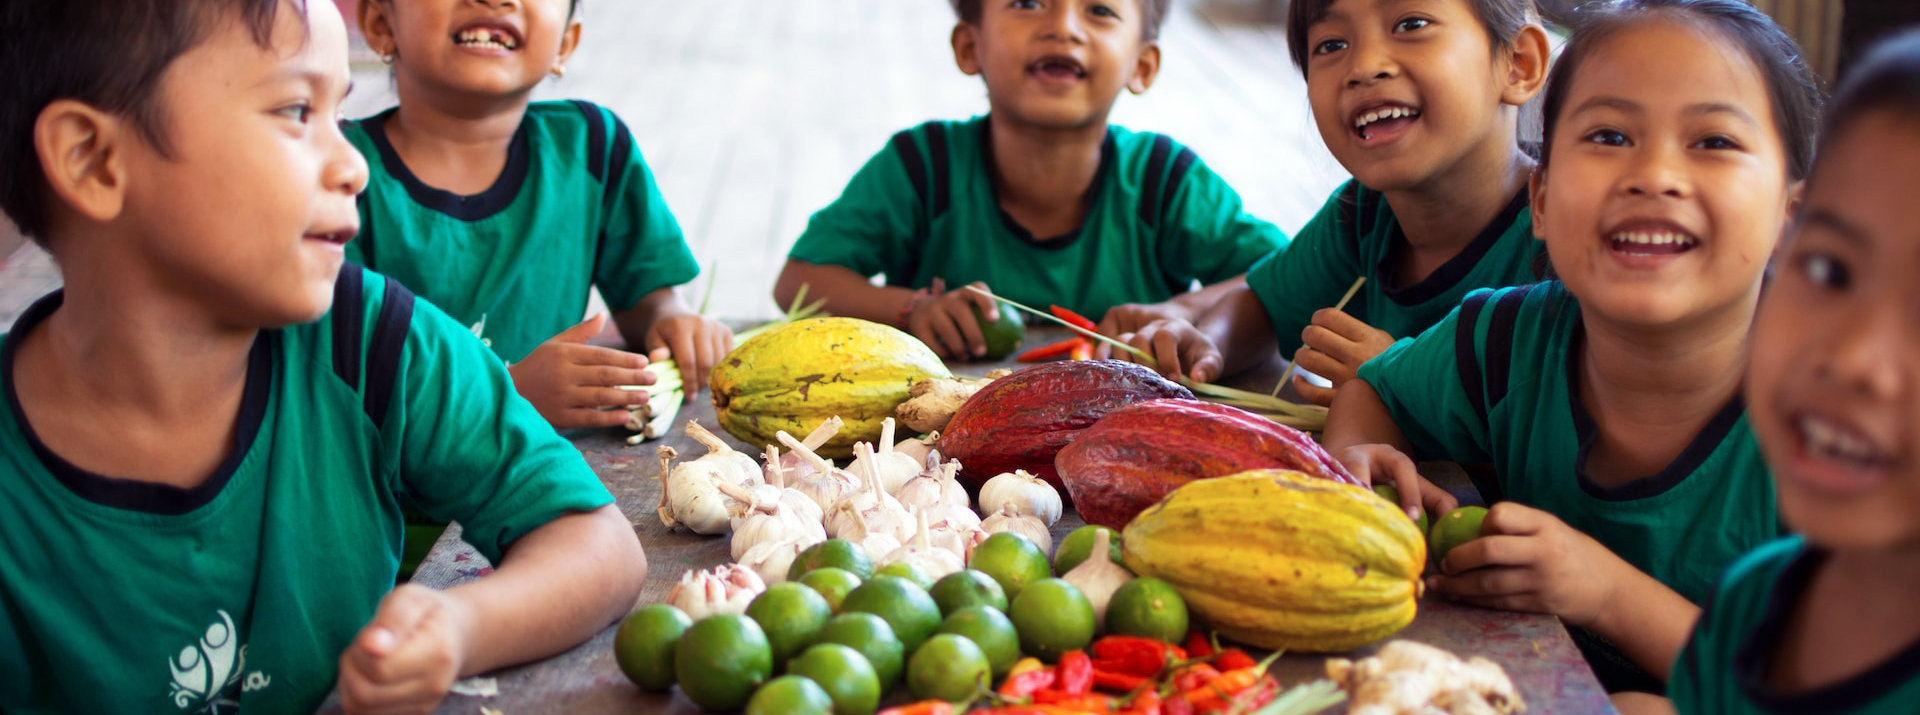 Anakardia Kids-nature produce learning